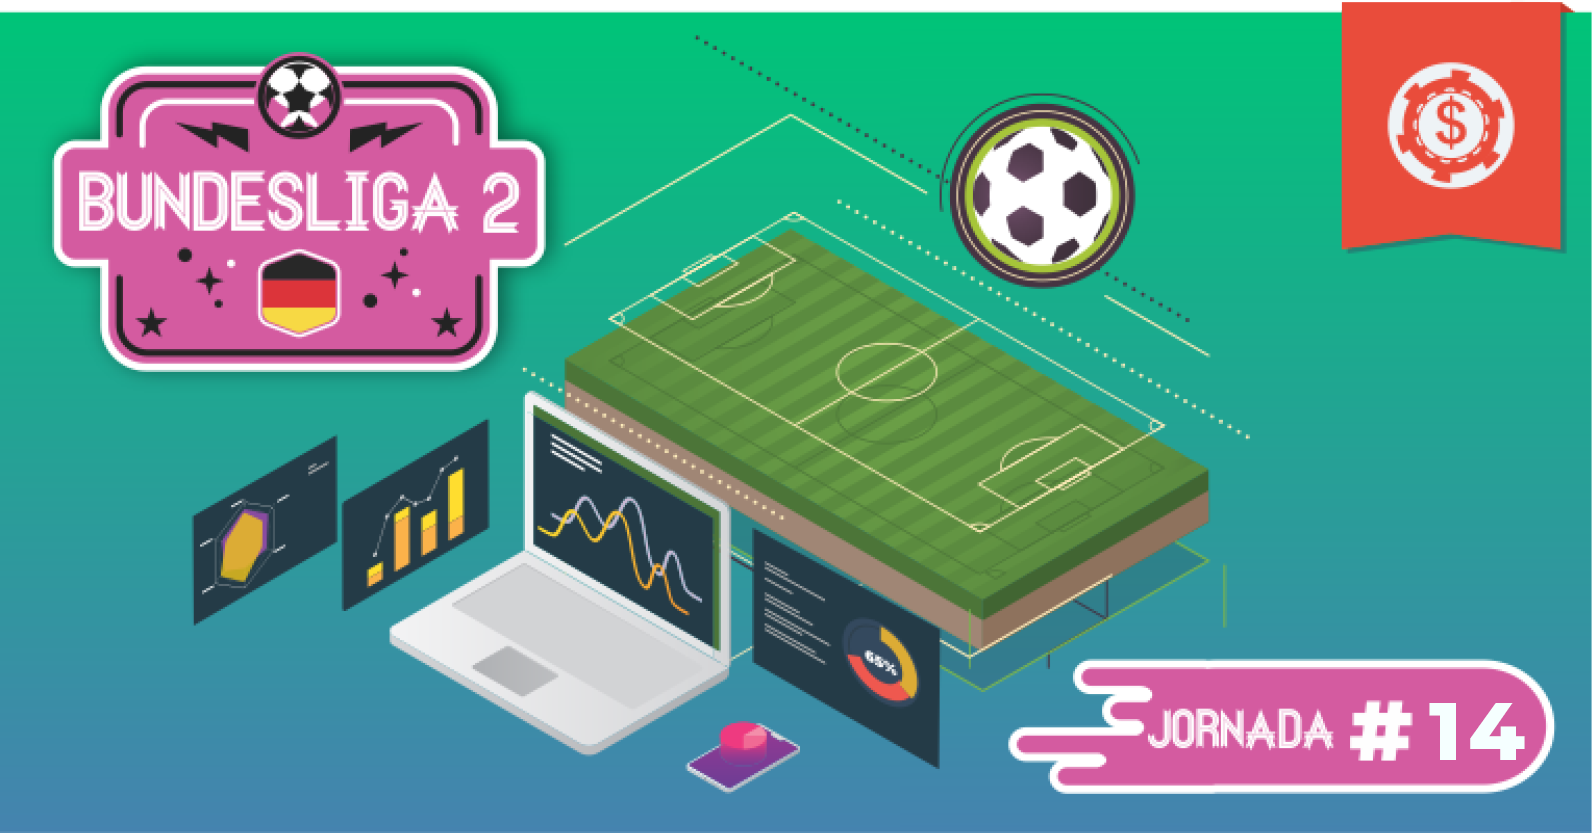 pronosticos-bundesliga-2-segunda-division-liga-alemana-apuestas-jornada-14-1